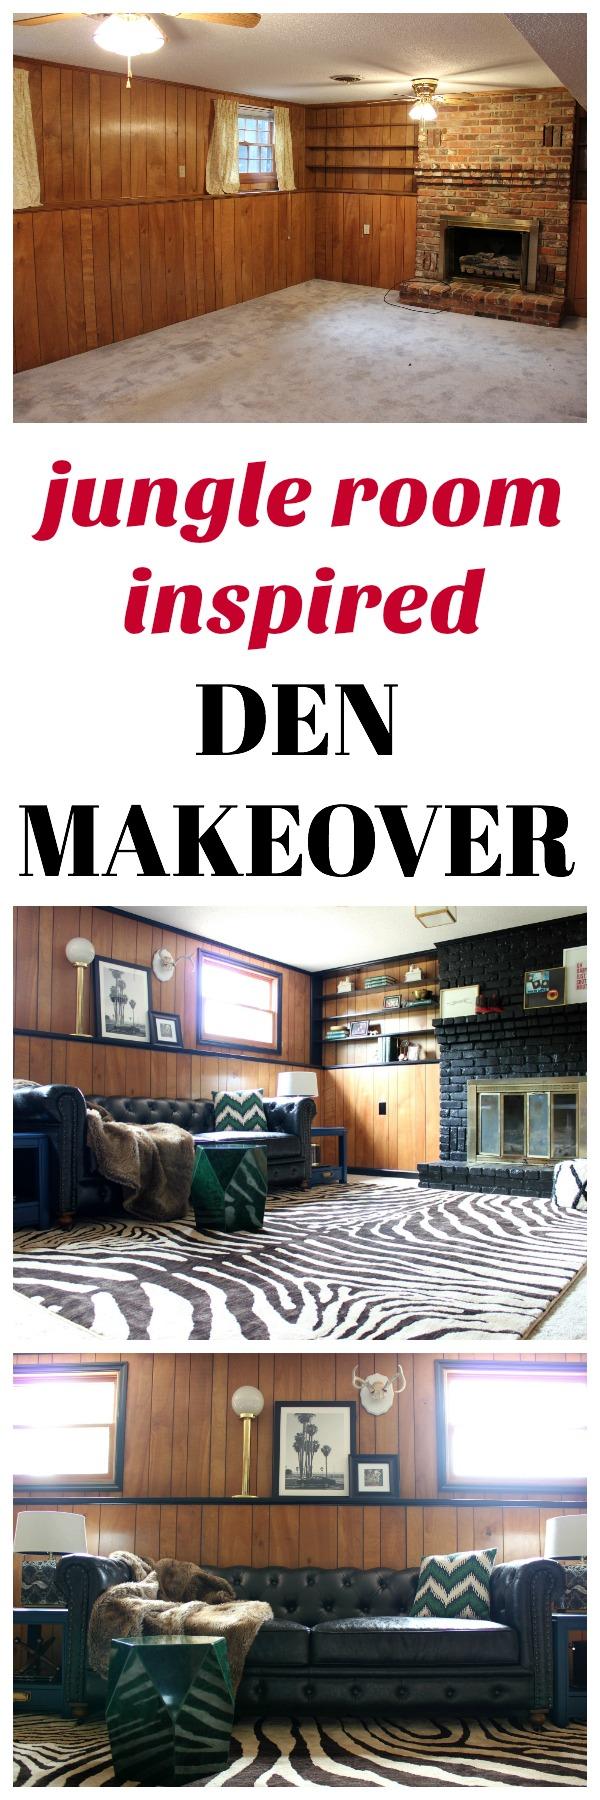 Jungle Room Inspired Den Makeover | Den Ideas | Den Decorating Ideas | Jungle Room Ideas | Elvis Jungle Room | Den Ideas with Fireplace